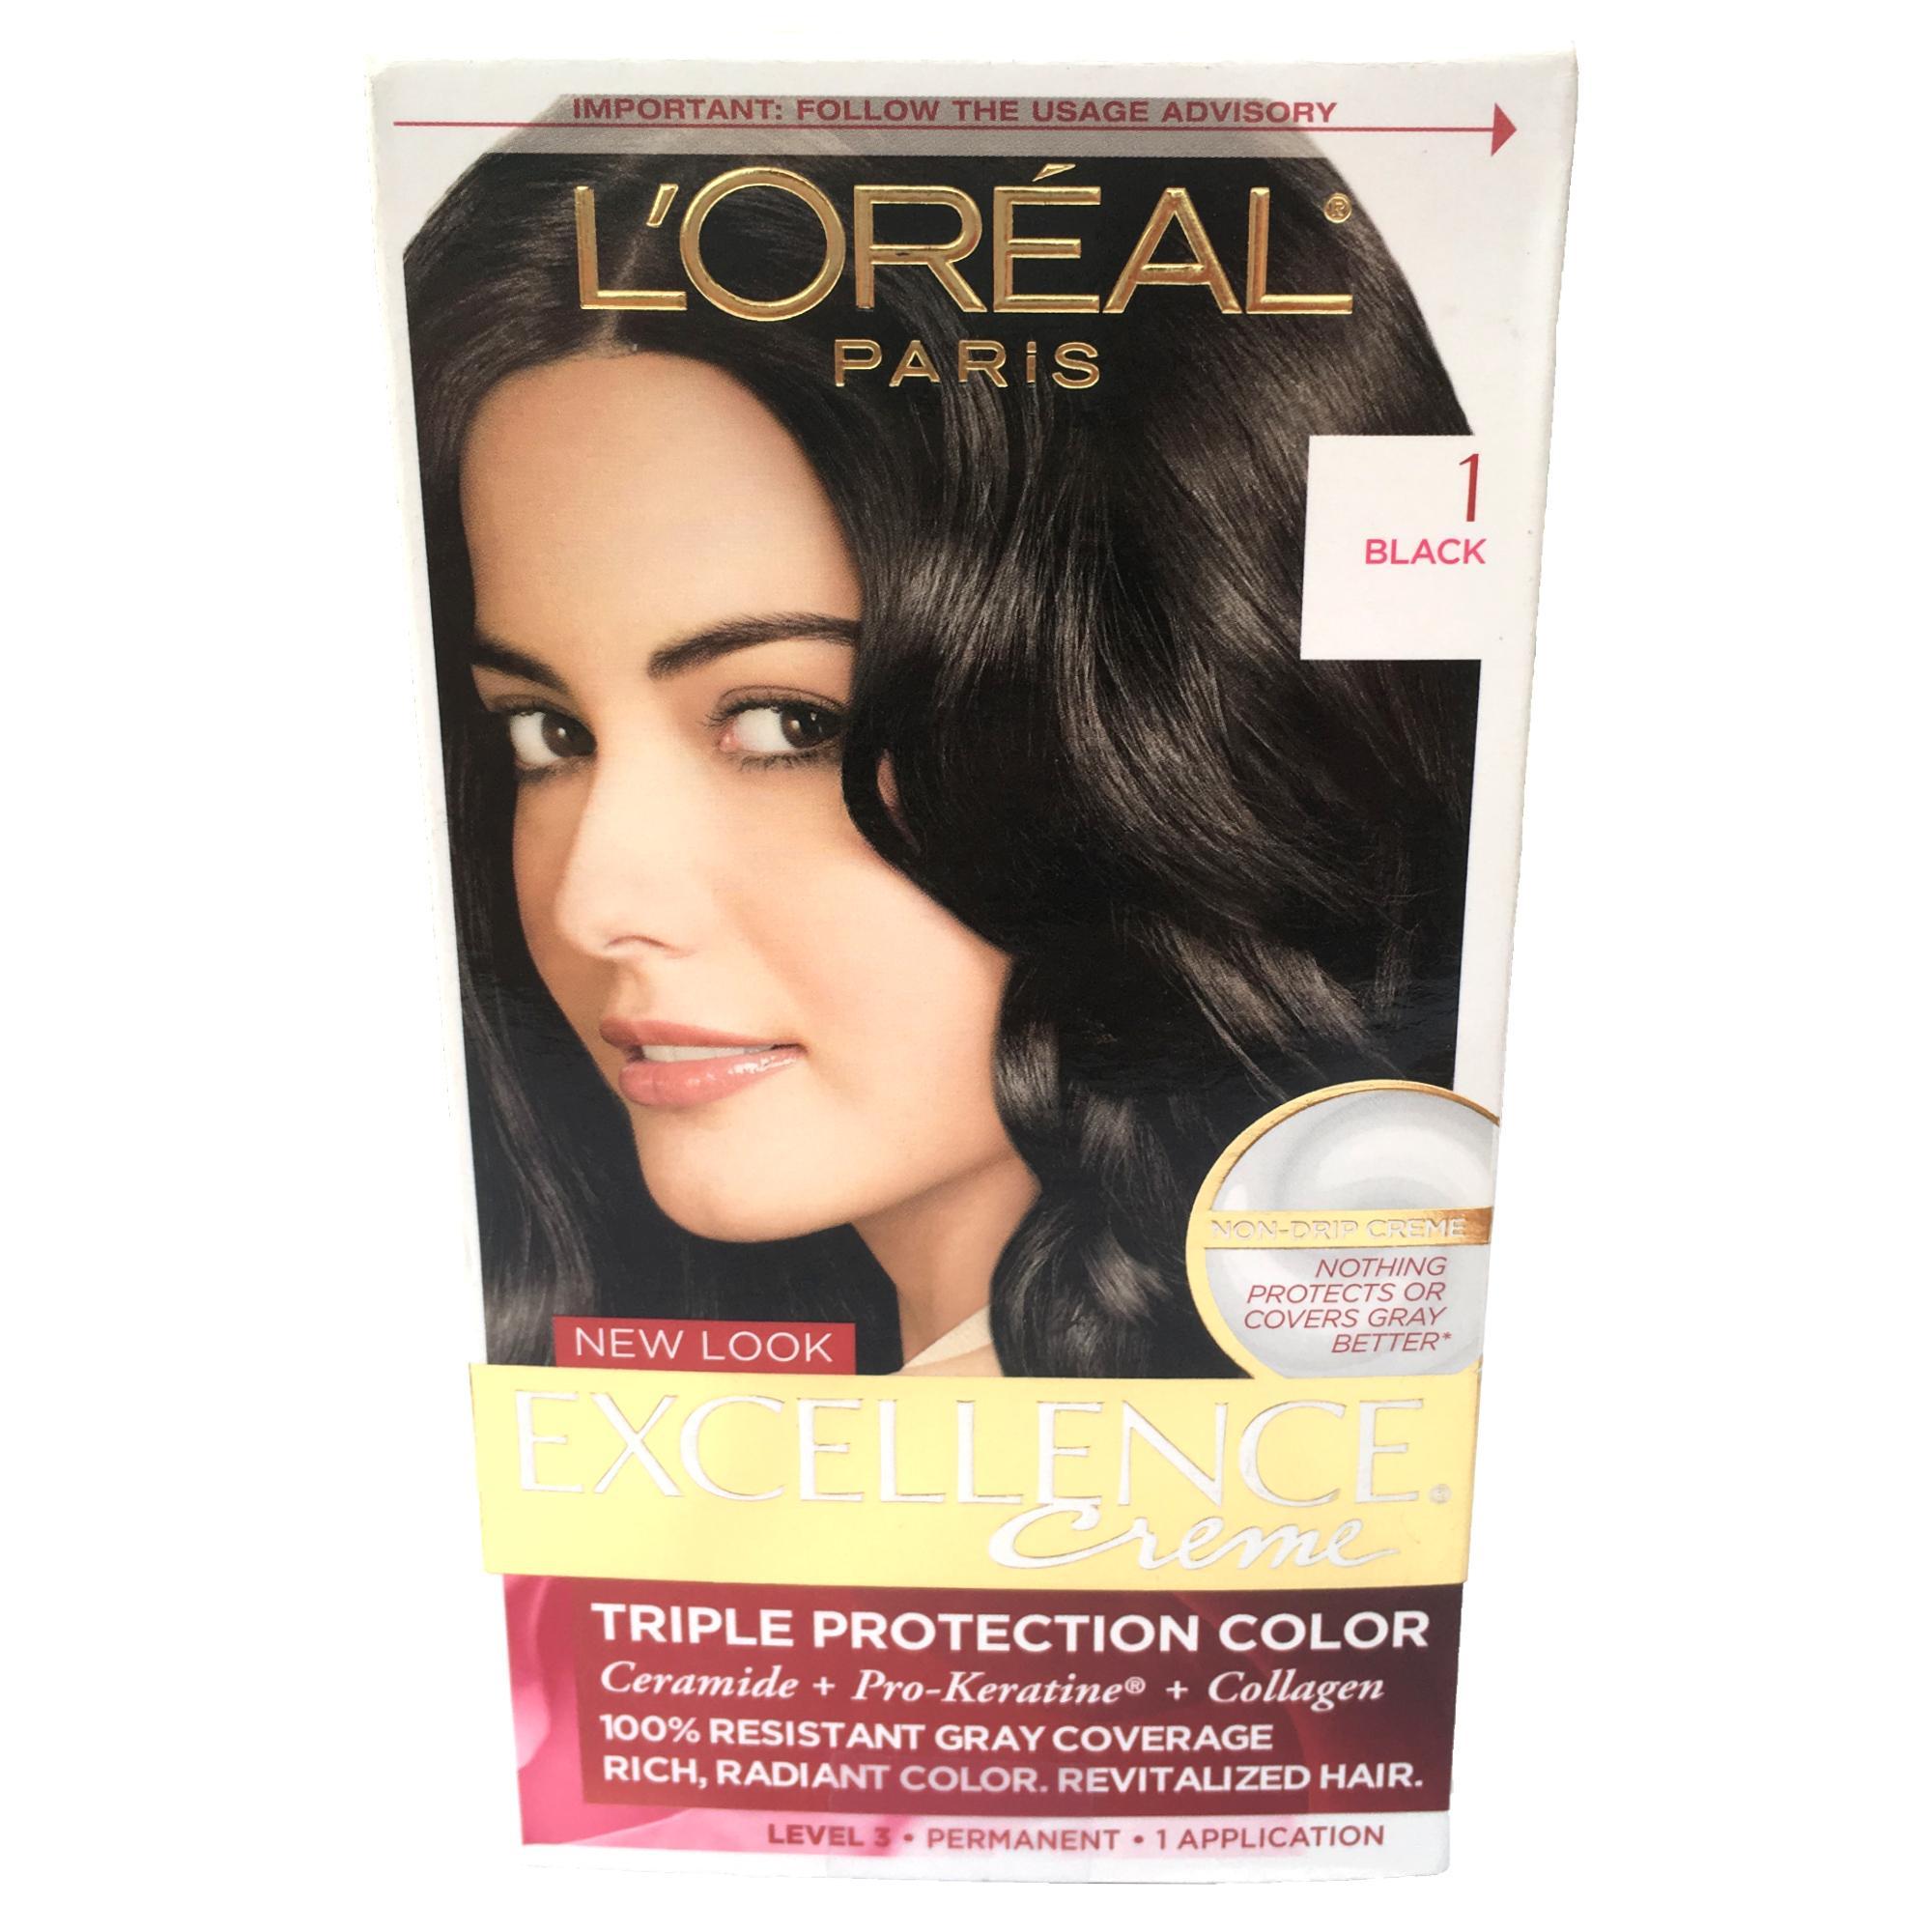 Hair Color Online In Bangladesh At Best Price - Daraz.com.bd